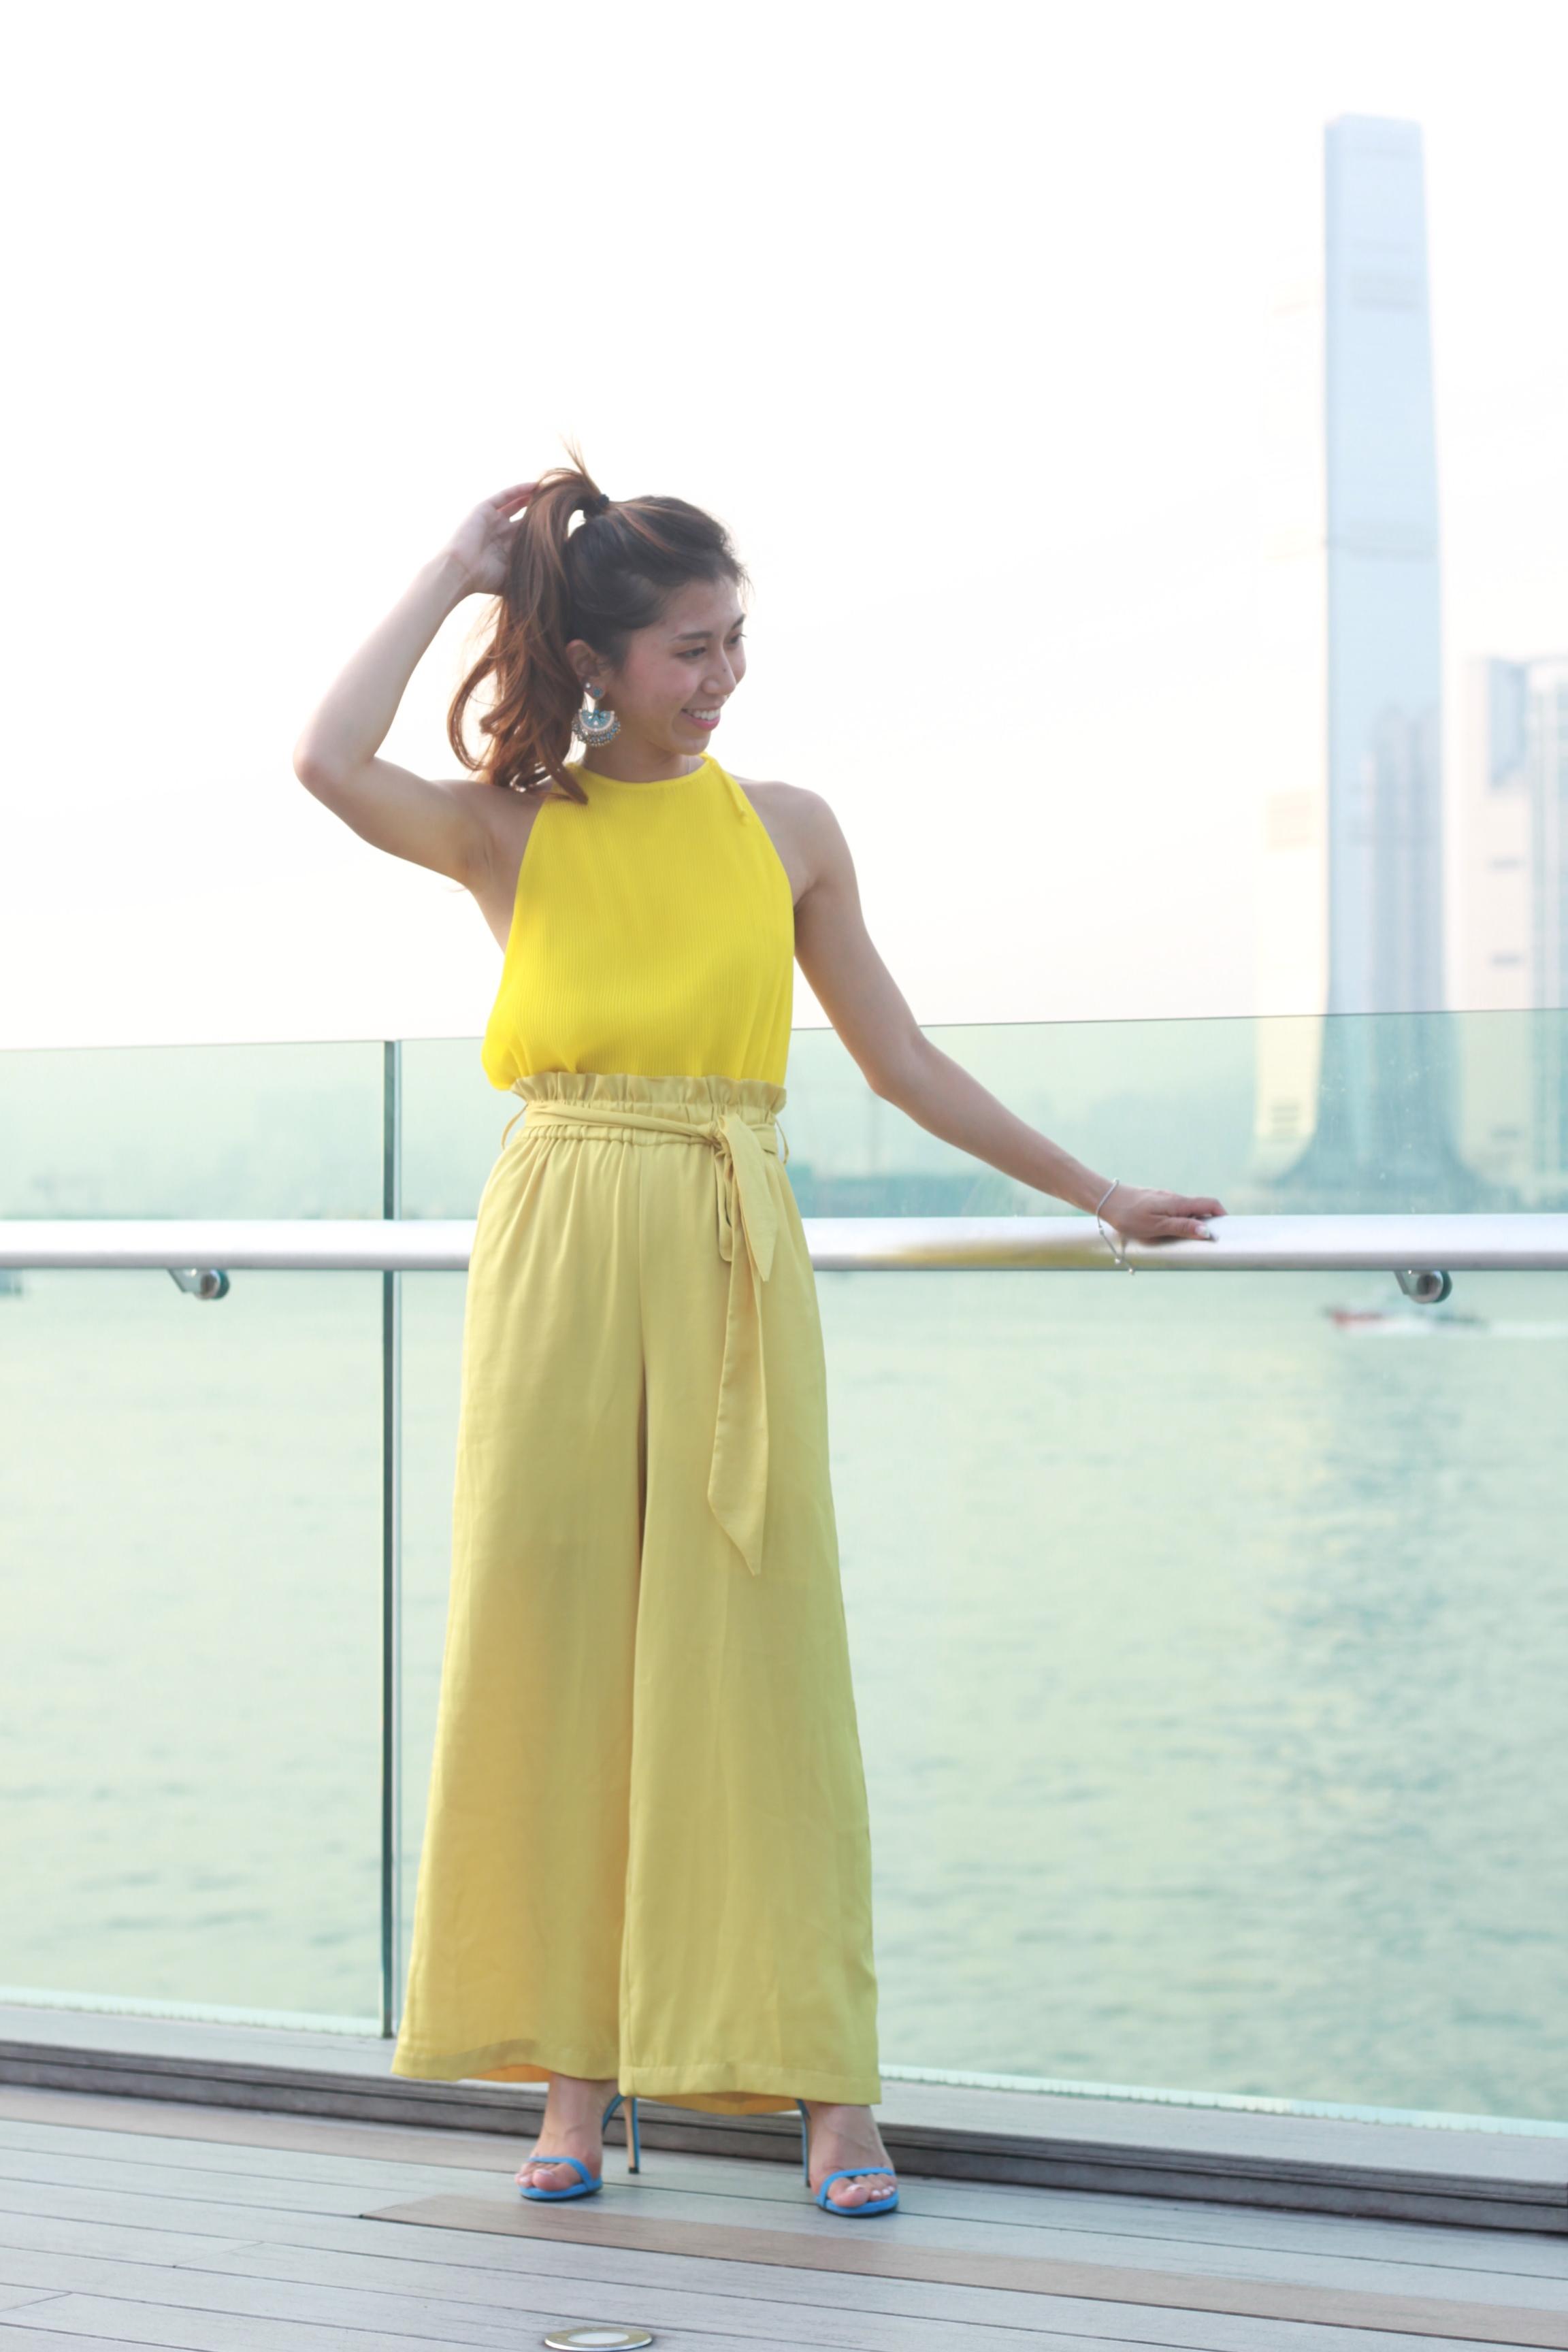 Mango pleated dress  /Mango yellow wide pants / Stuart Weitzman 'nudist song' colourblock suede sandals